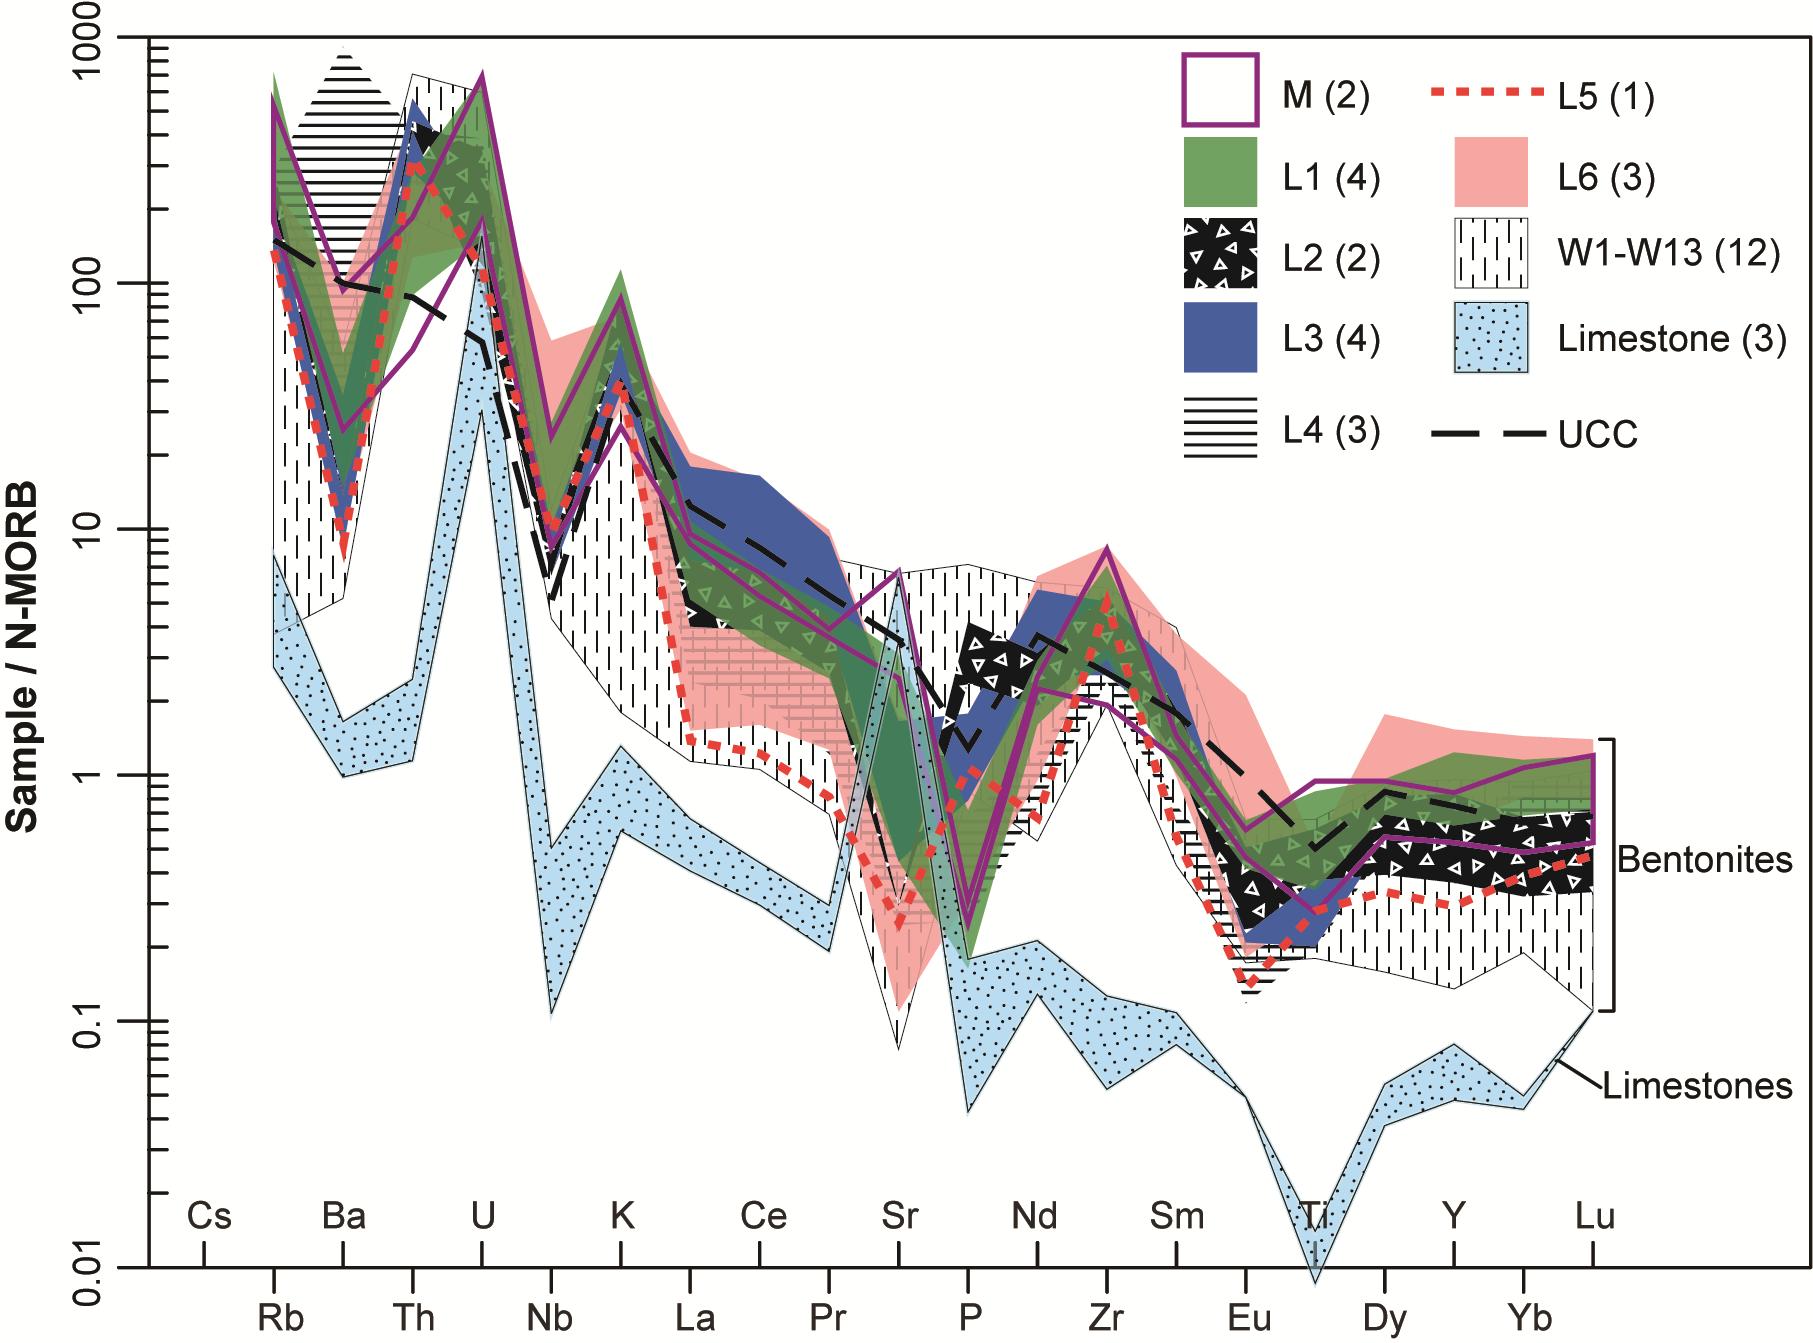 Geochemistry and origin of Carboniferous (Mississippian